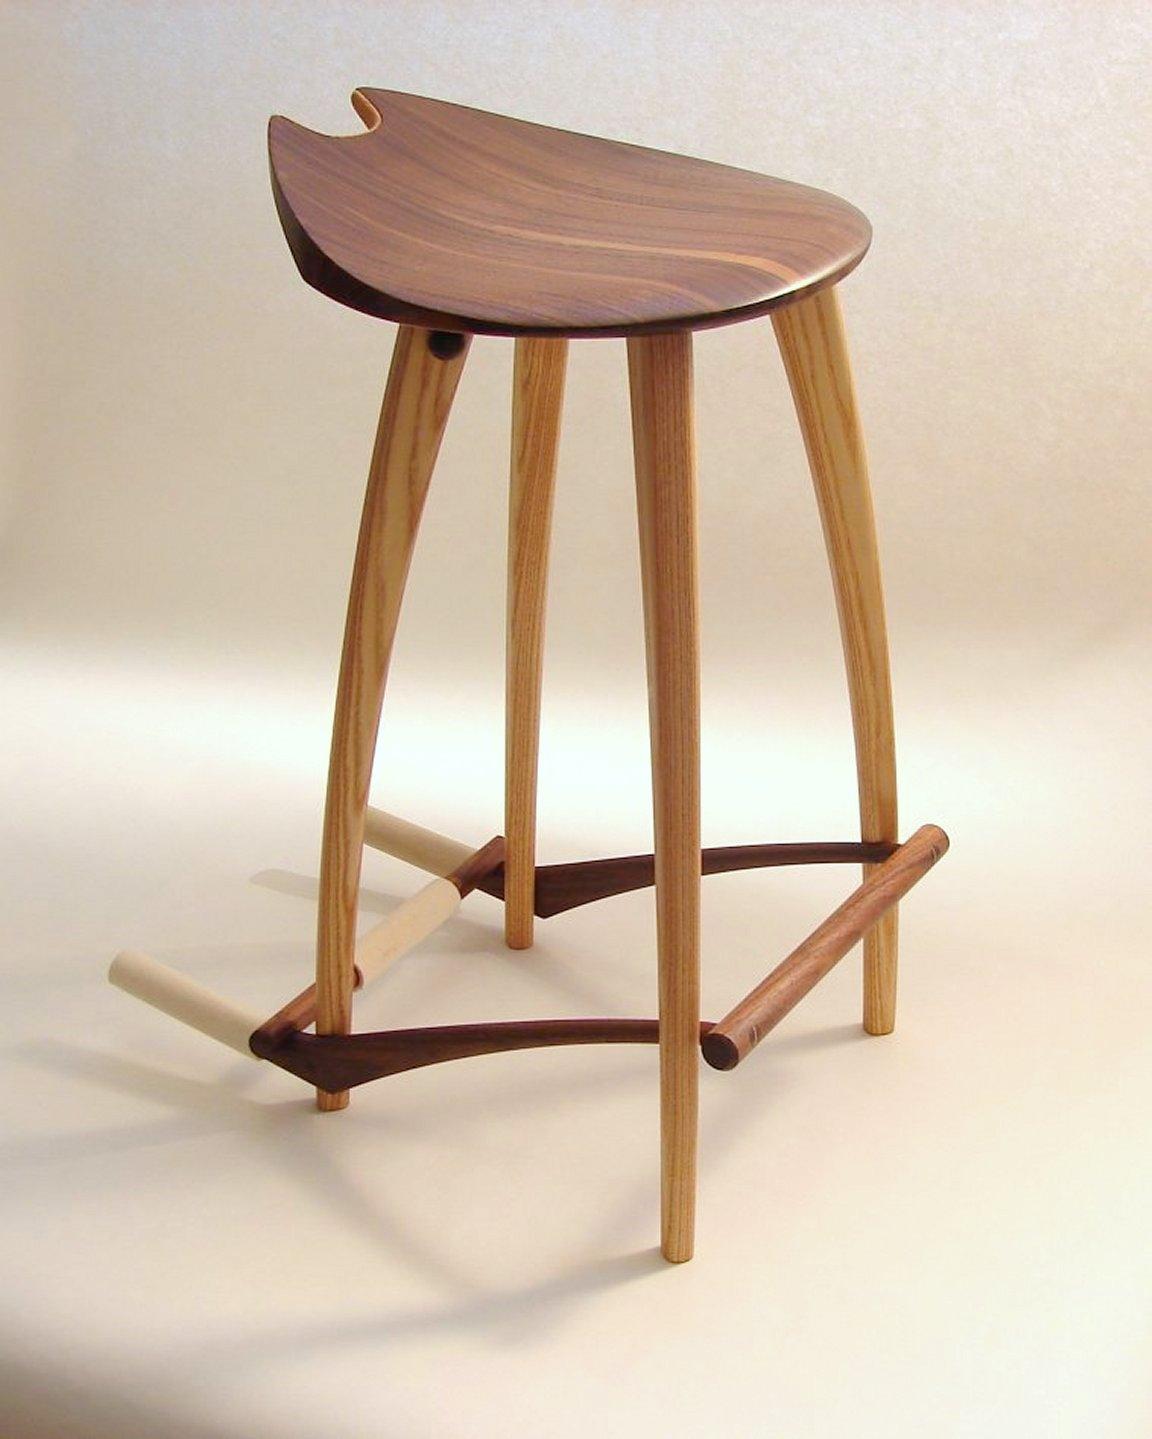 free wooden guitar stand plans craftsmanship pinterest guitar stand tips and woodworking. Black Bedroom Furniture Sets. Home Design Ideas